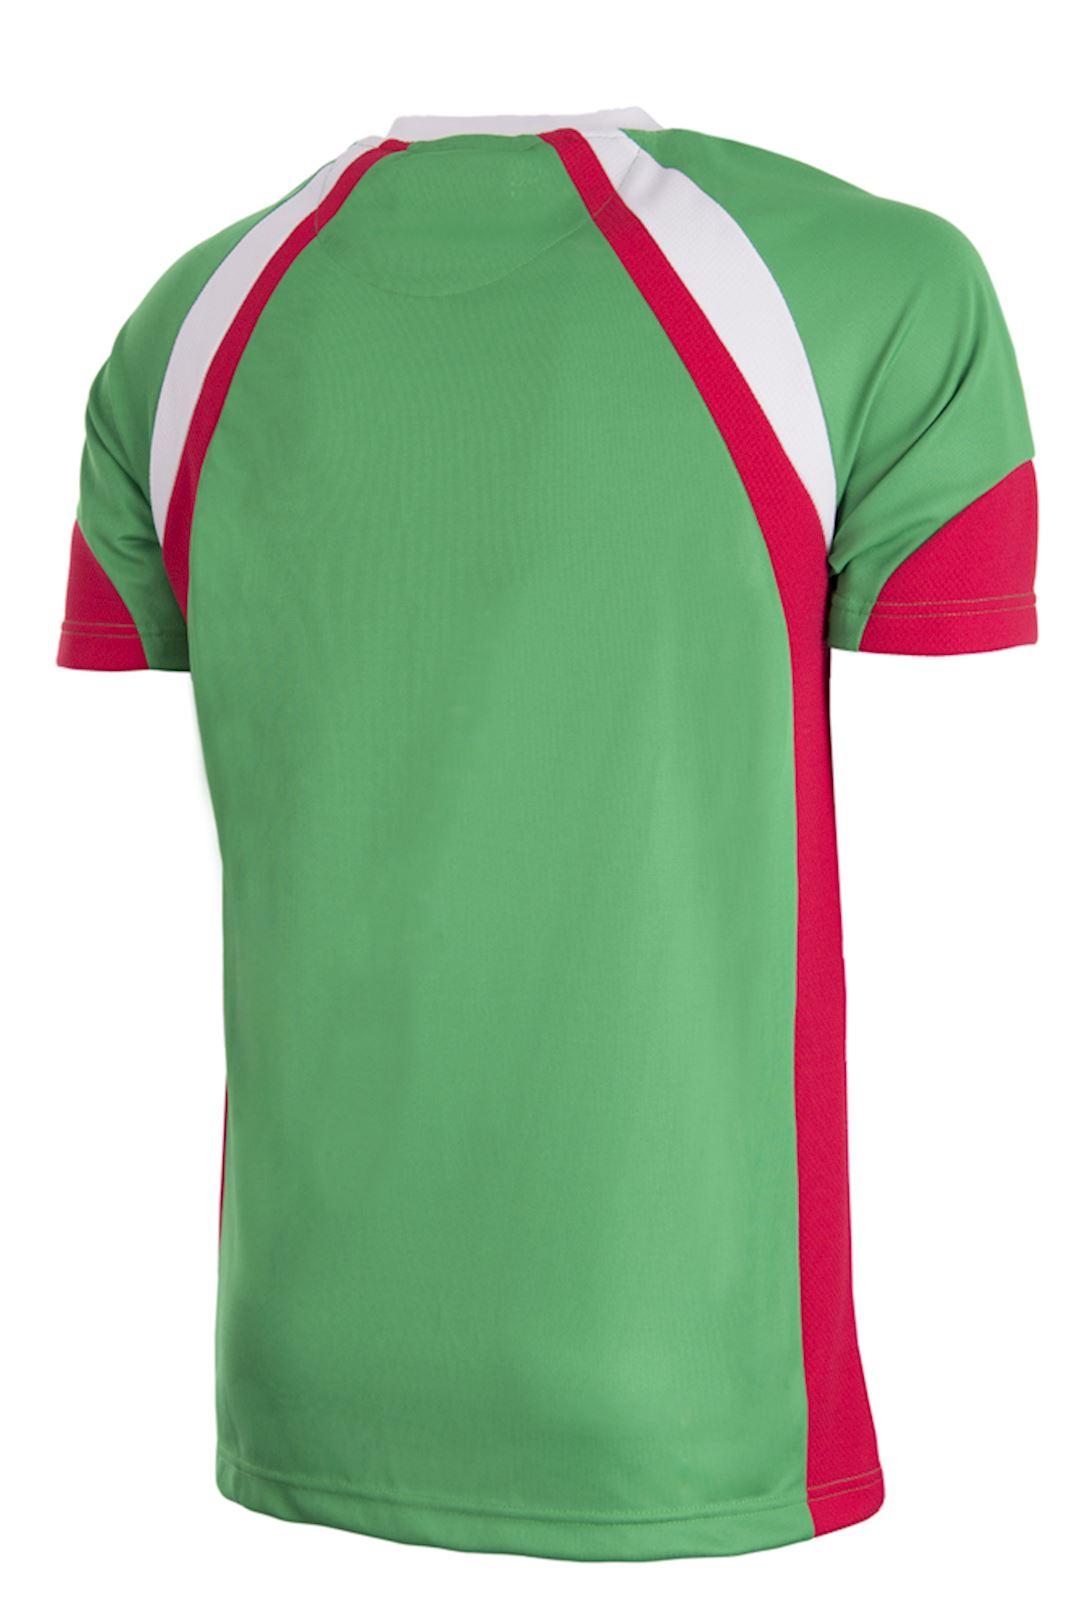 Cork City FC 2004 - 05 Retro Football Shirt | 4 | COPA